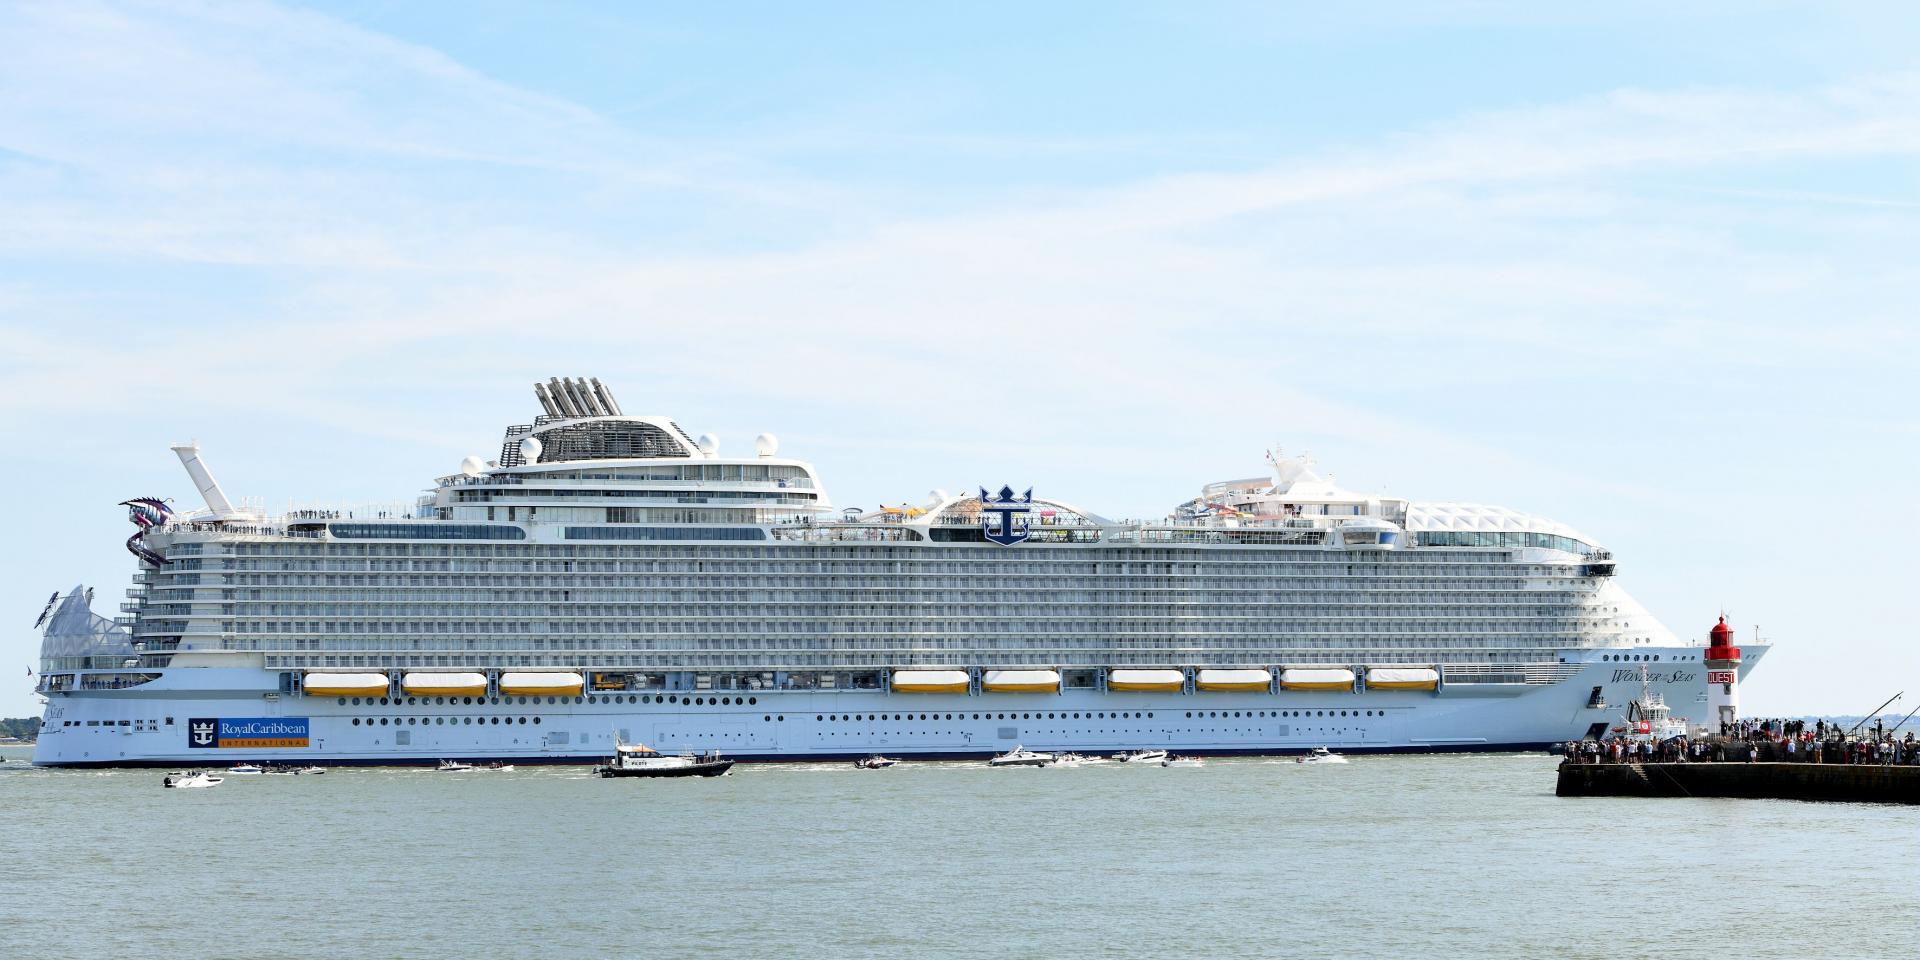 Wonder Of The Seas Essais En Mer Carene Martin Launay 23 08 2021 3